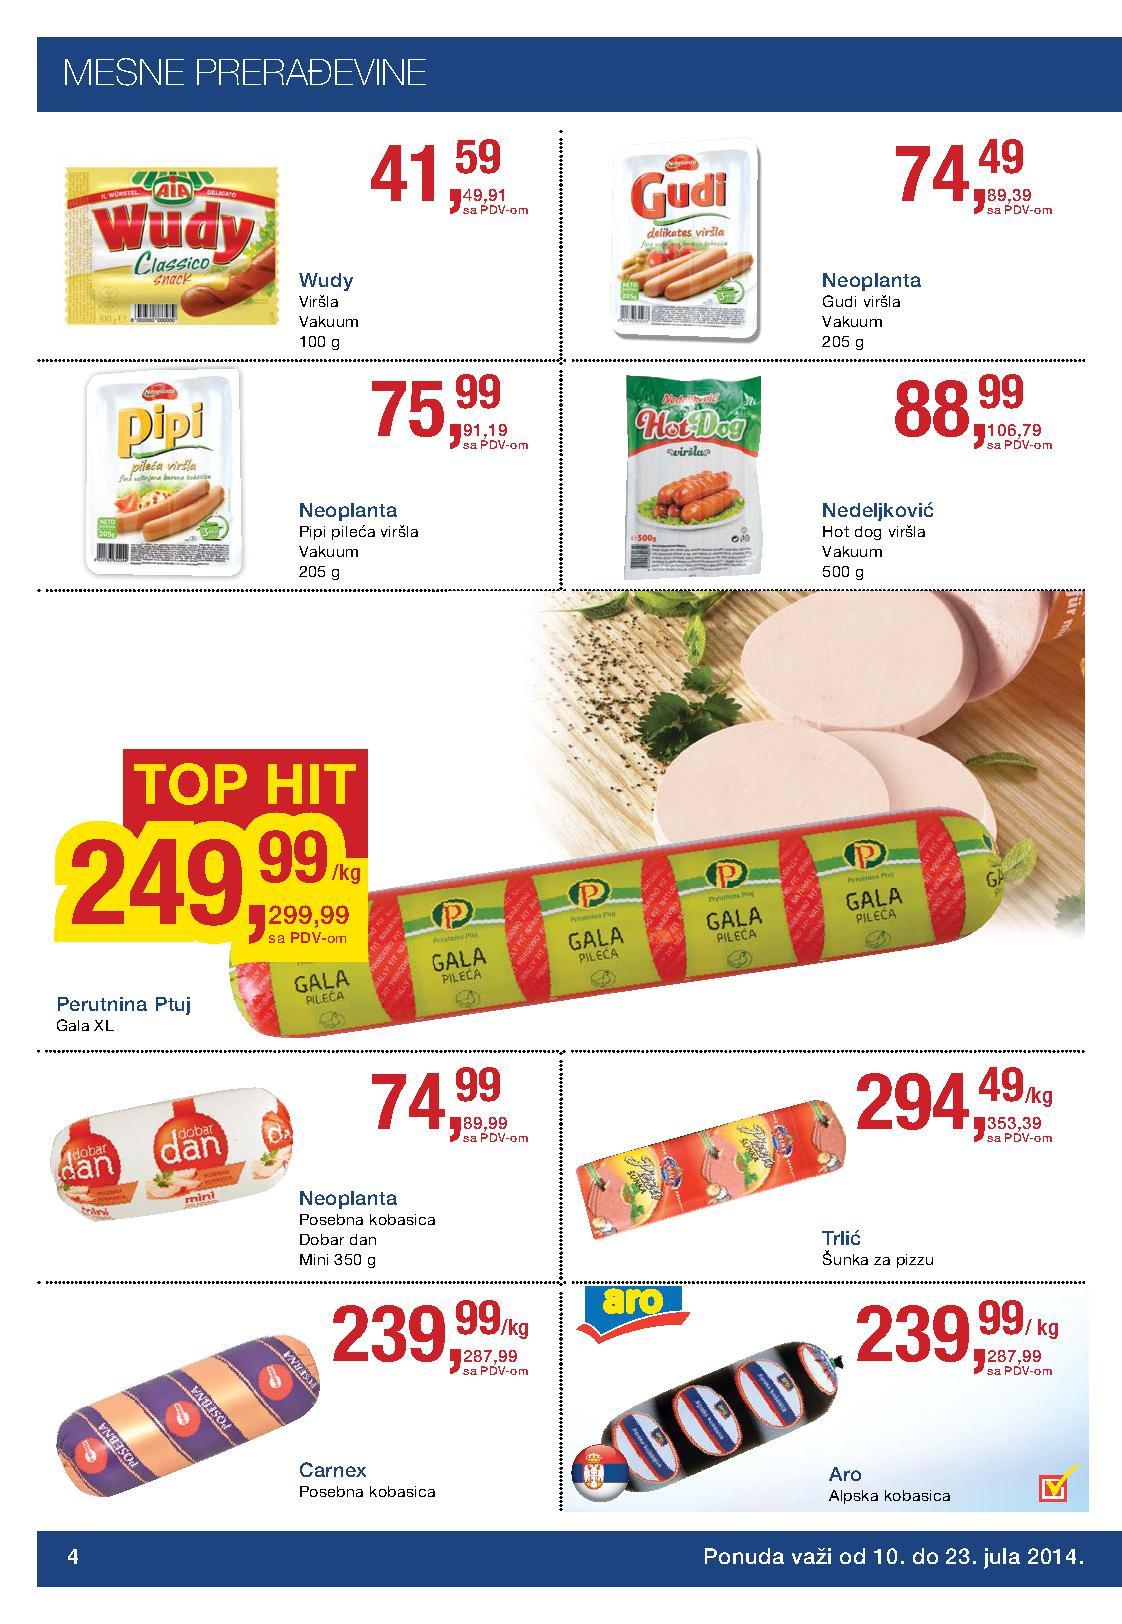 Metro prehrana akcija sjajnih cena